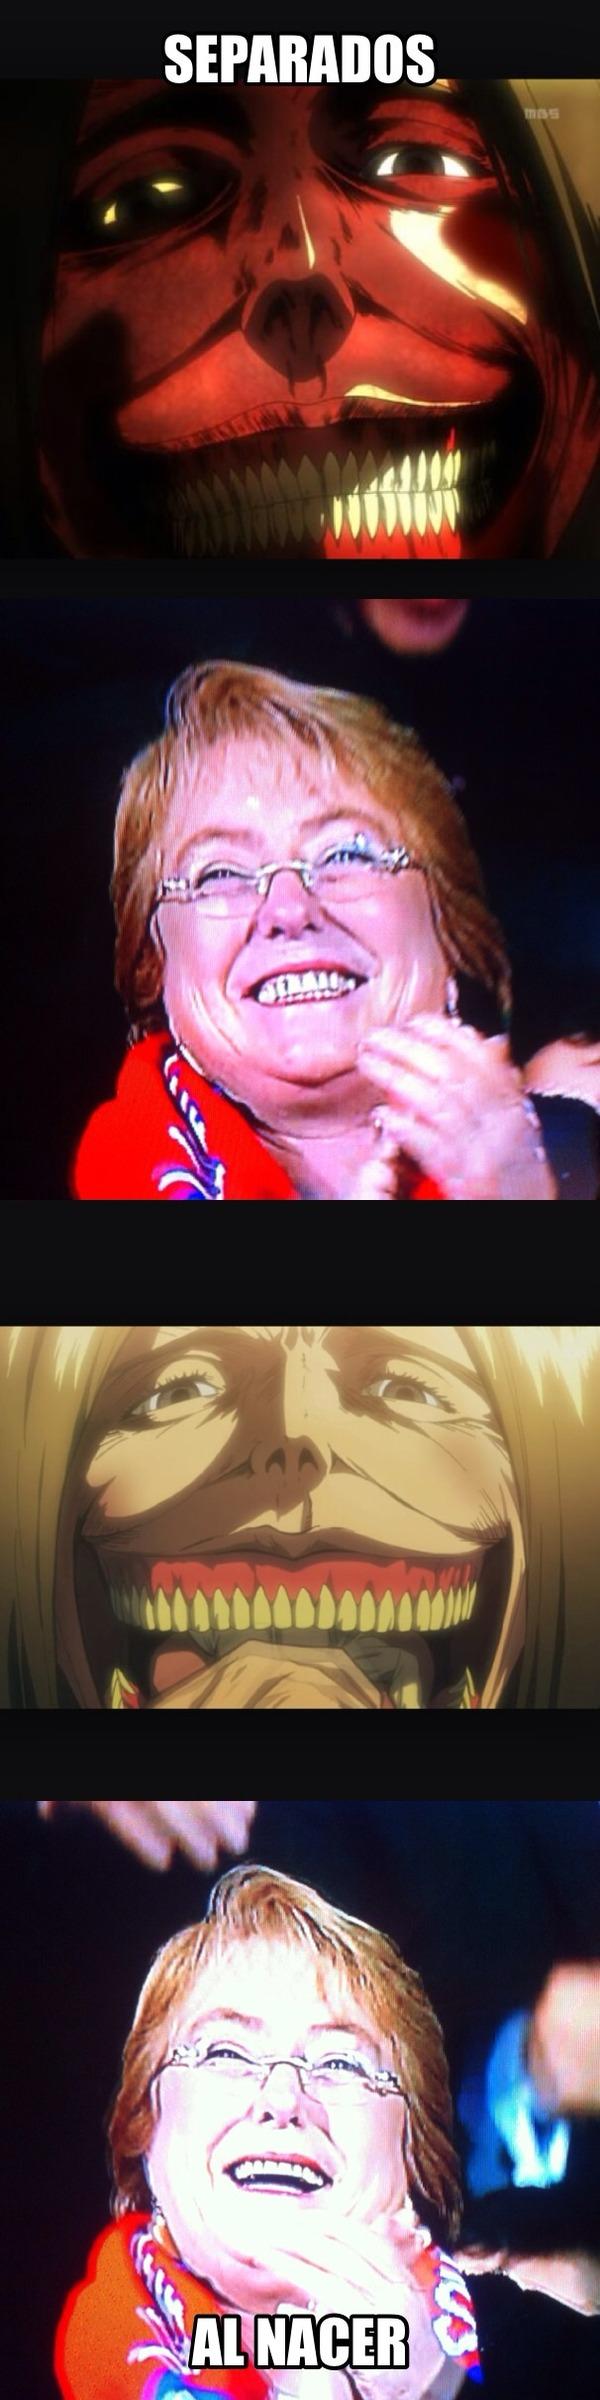 VAMO CHILE!! - meme